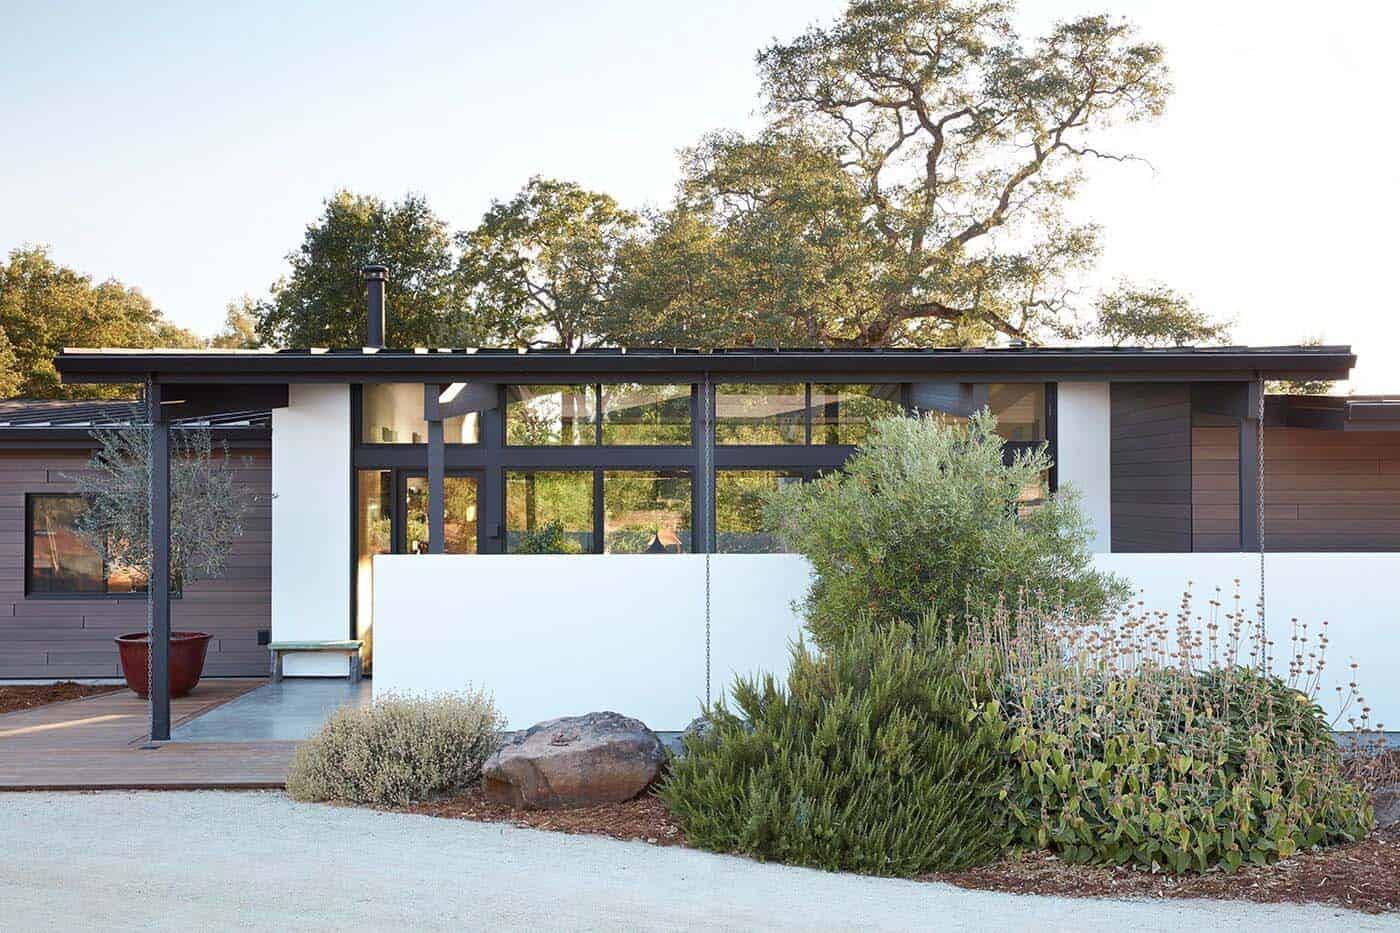 Sacramento Modern Residence-Klopf Architecture-01-1 Kindesign